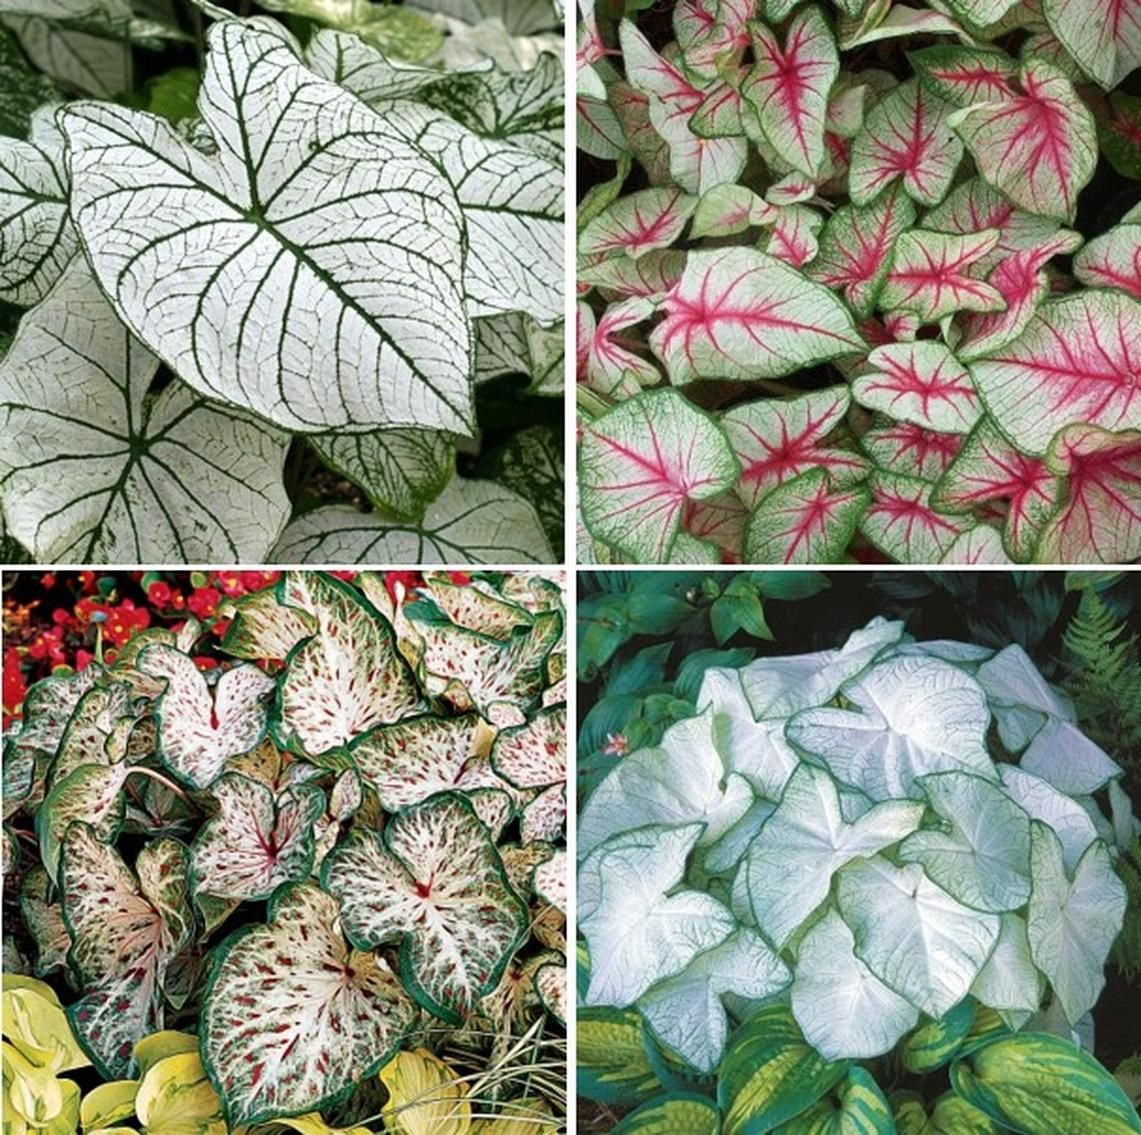 Caladium Bulbs White Mix Shipping Now Plants, Indoor